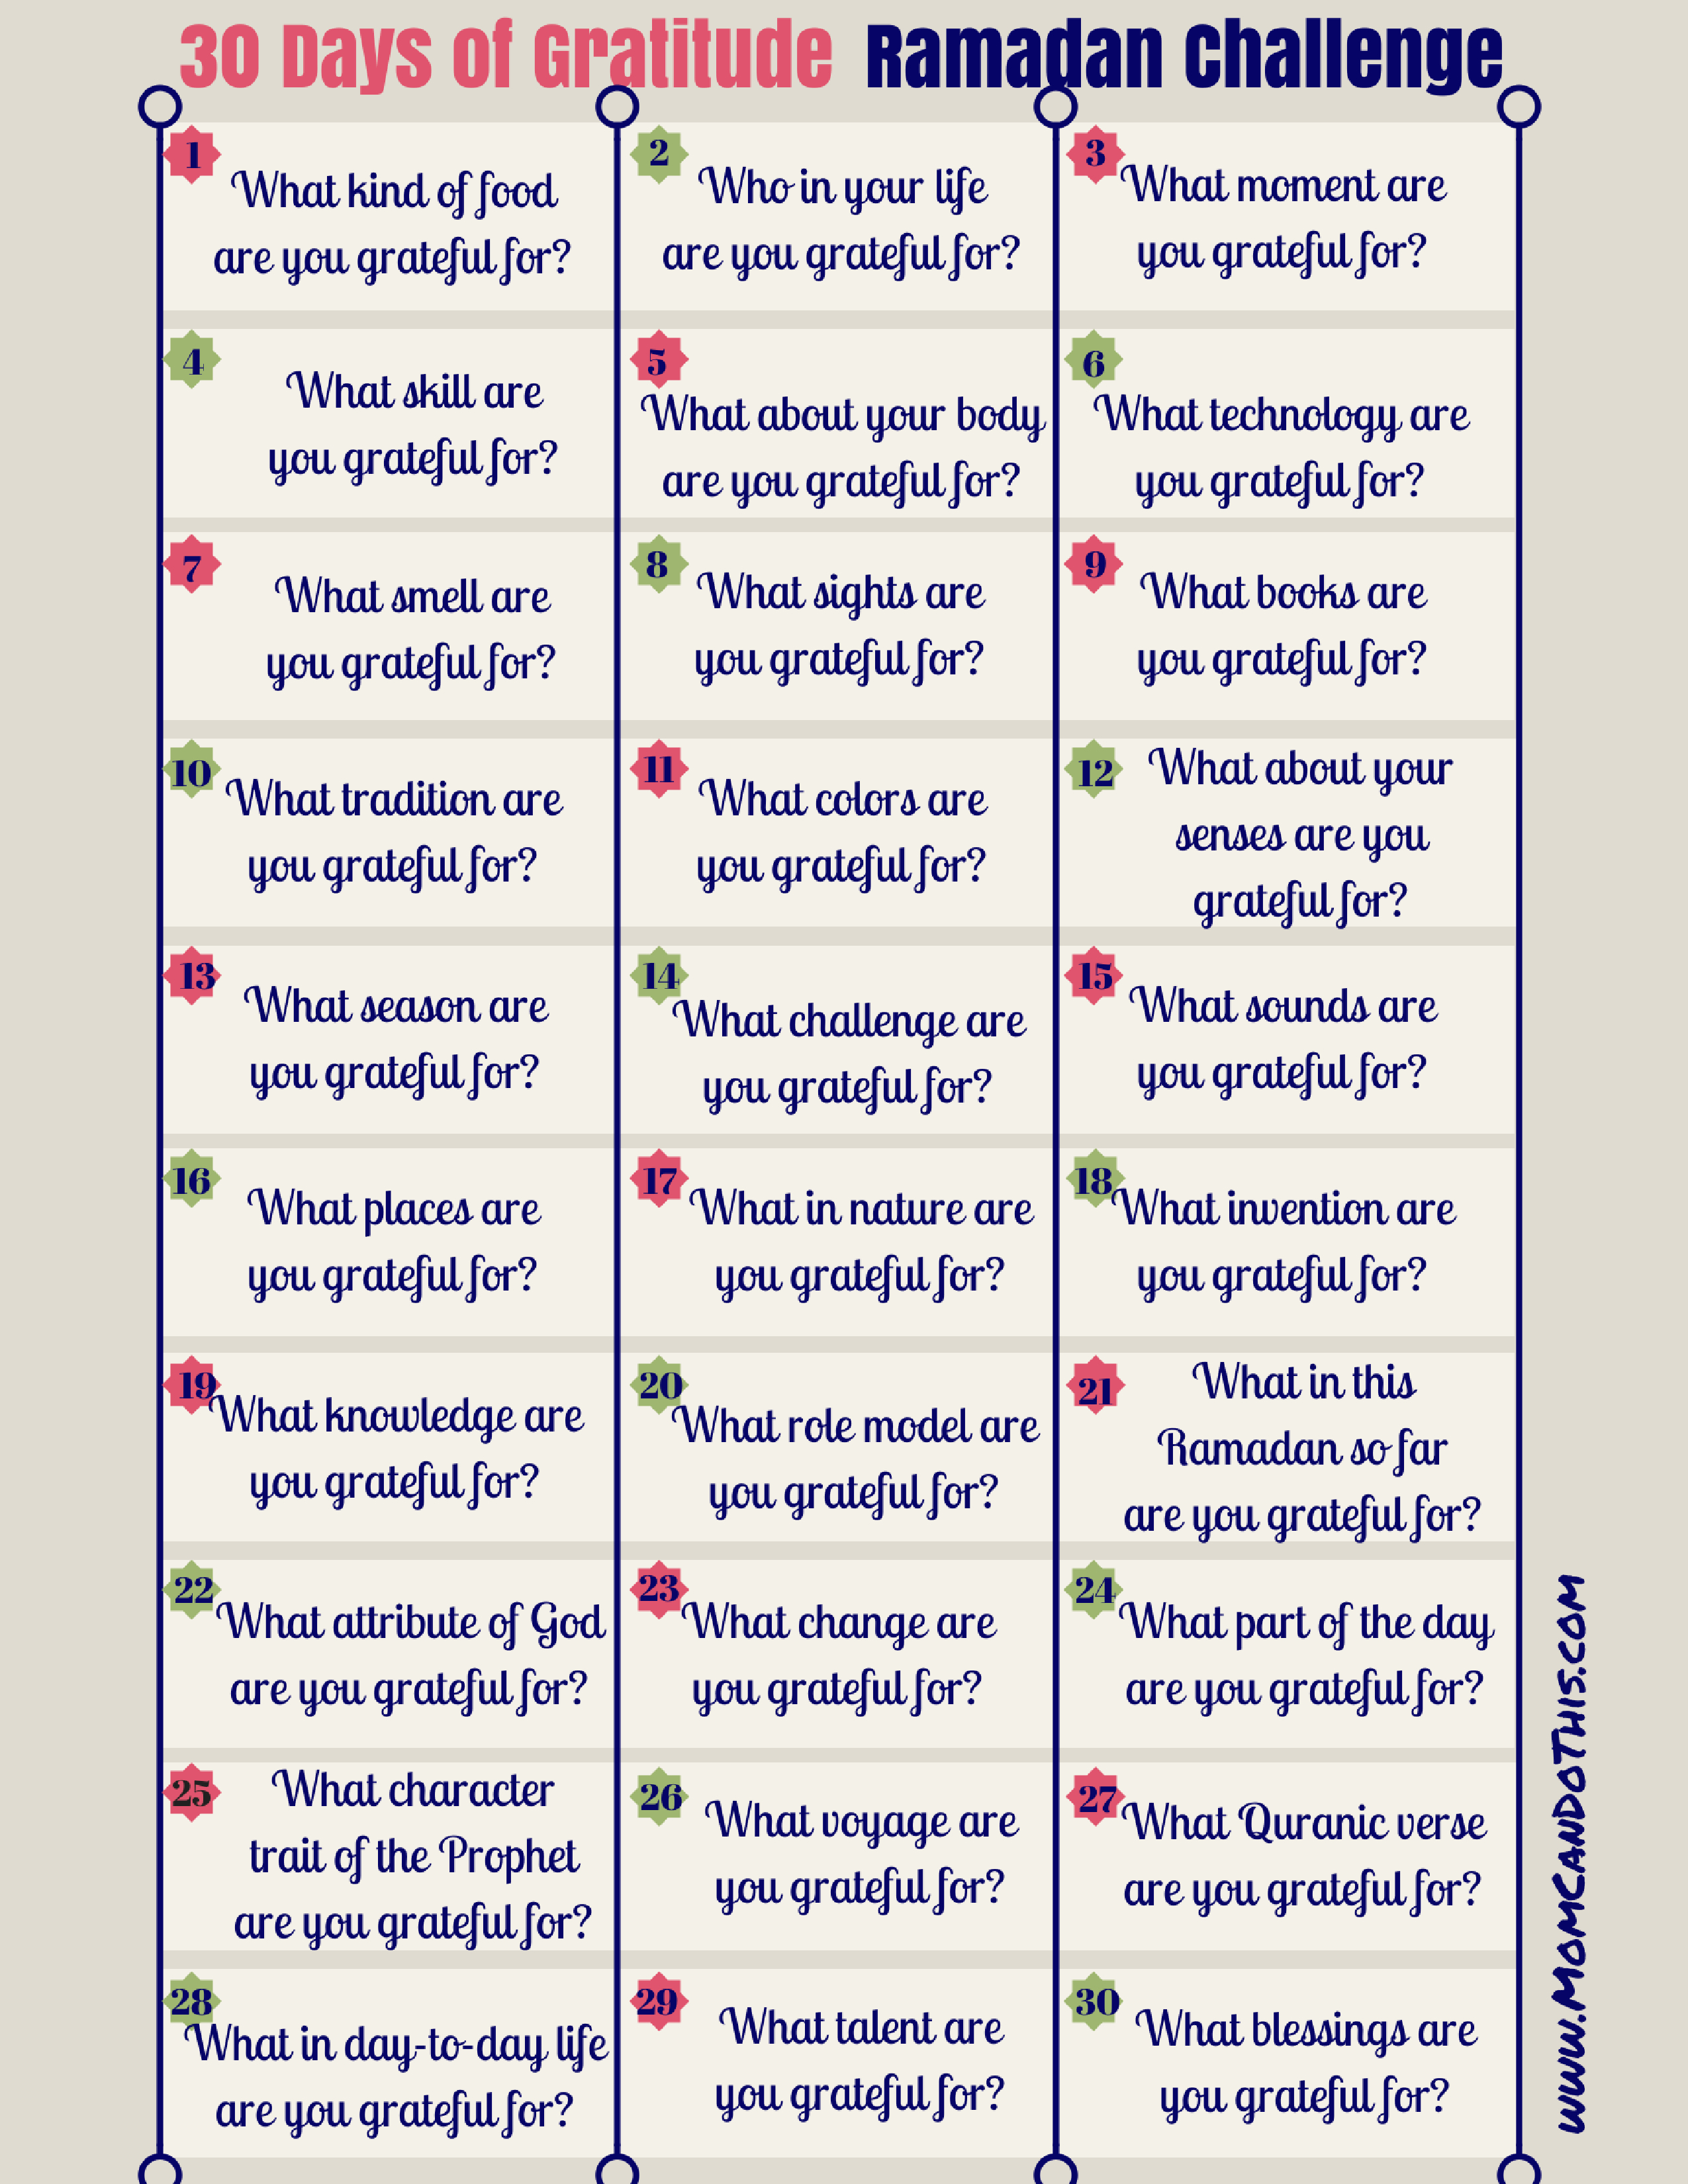 Ramadan Gratitude Challenge - 30 Day Challenge. Make Ramadan Count! | Free Printable Gratitude Worksheets